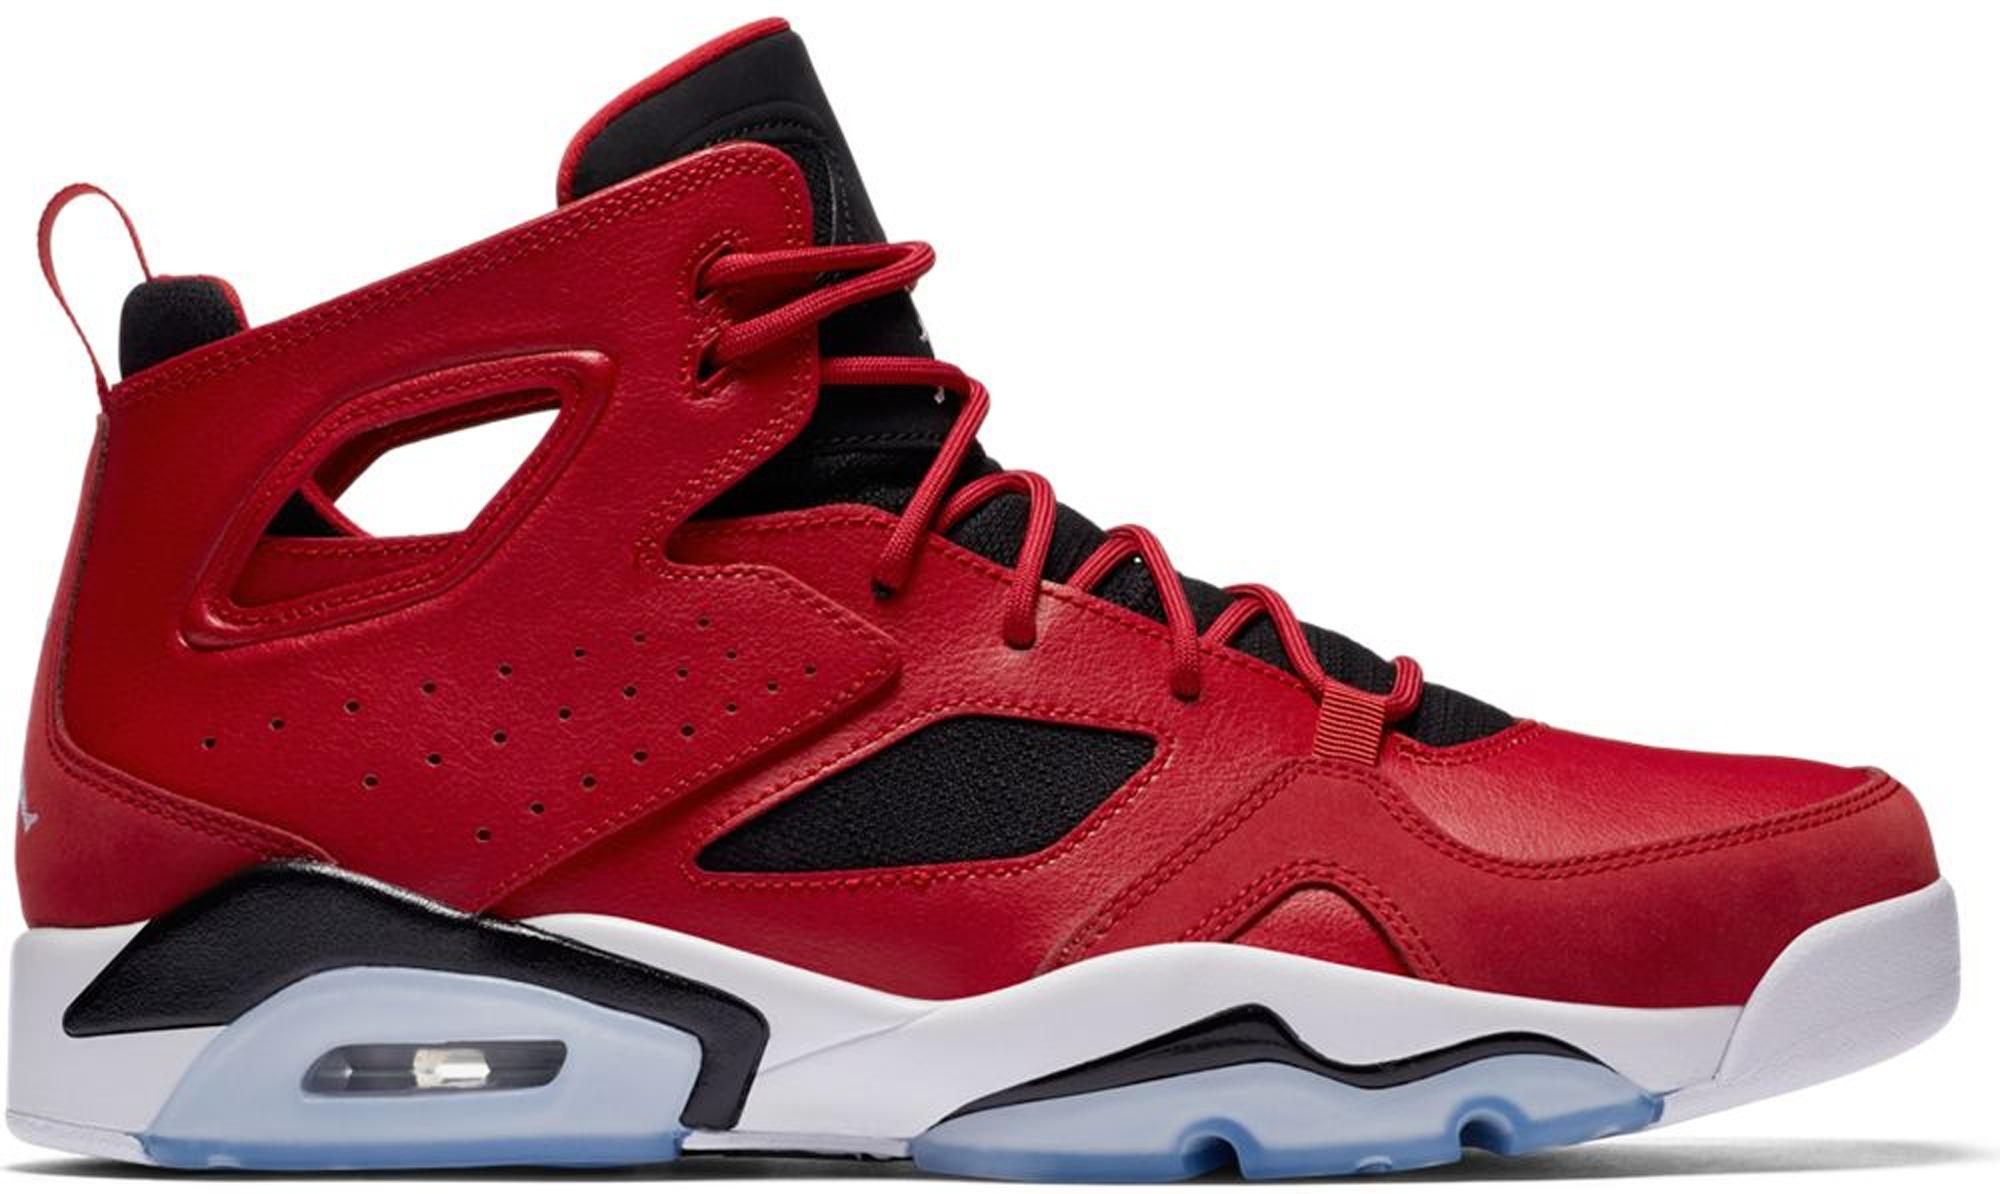 Jordan Flightclub 91 Gym Red - 555475-600